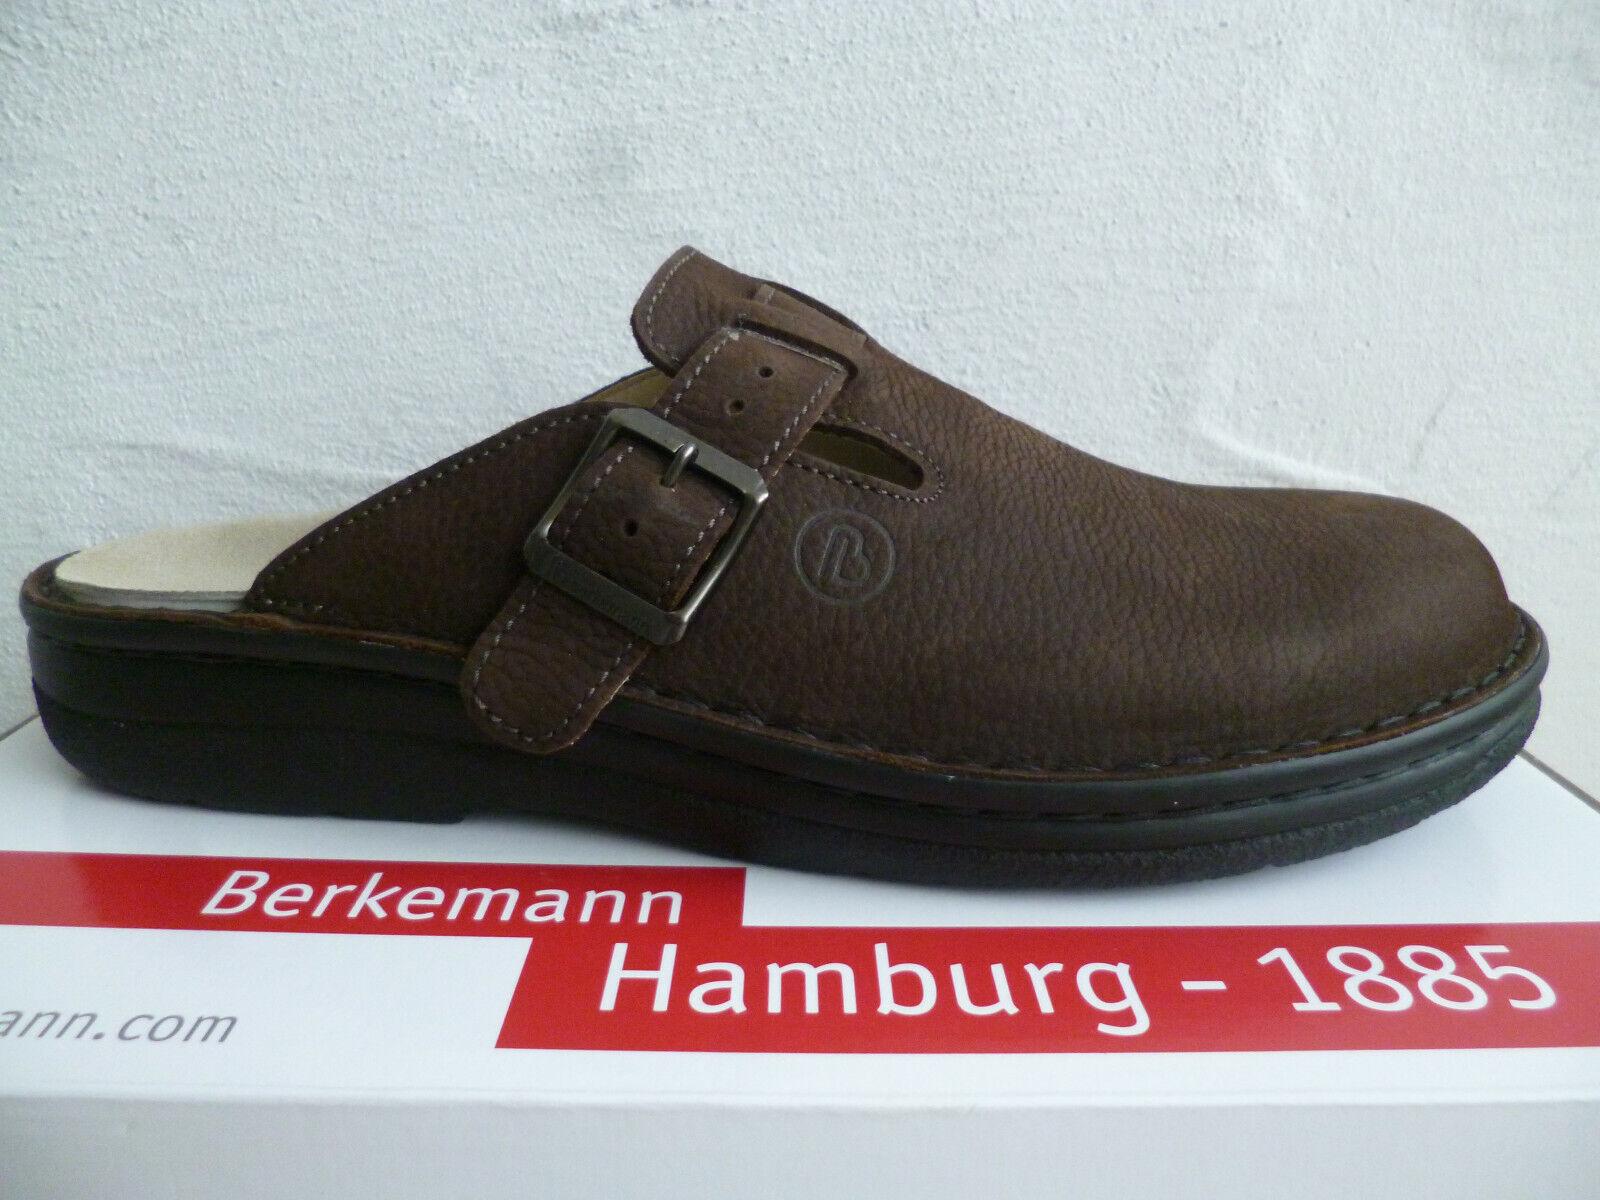 Berkemann Men's Clogs Sabot Mules Slippers Leather Mocha 05708 New